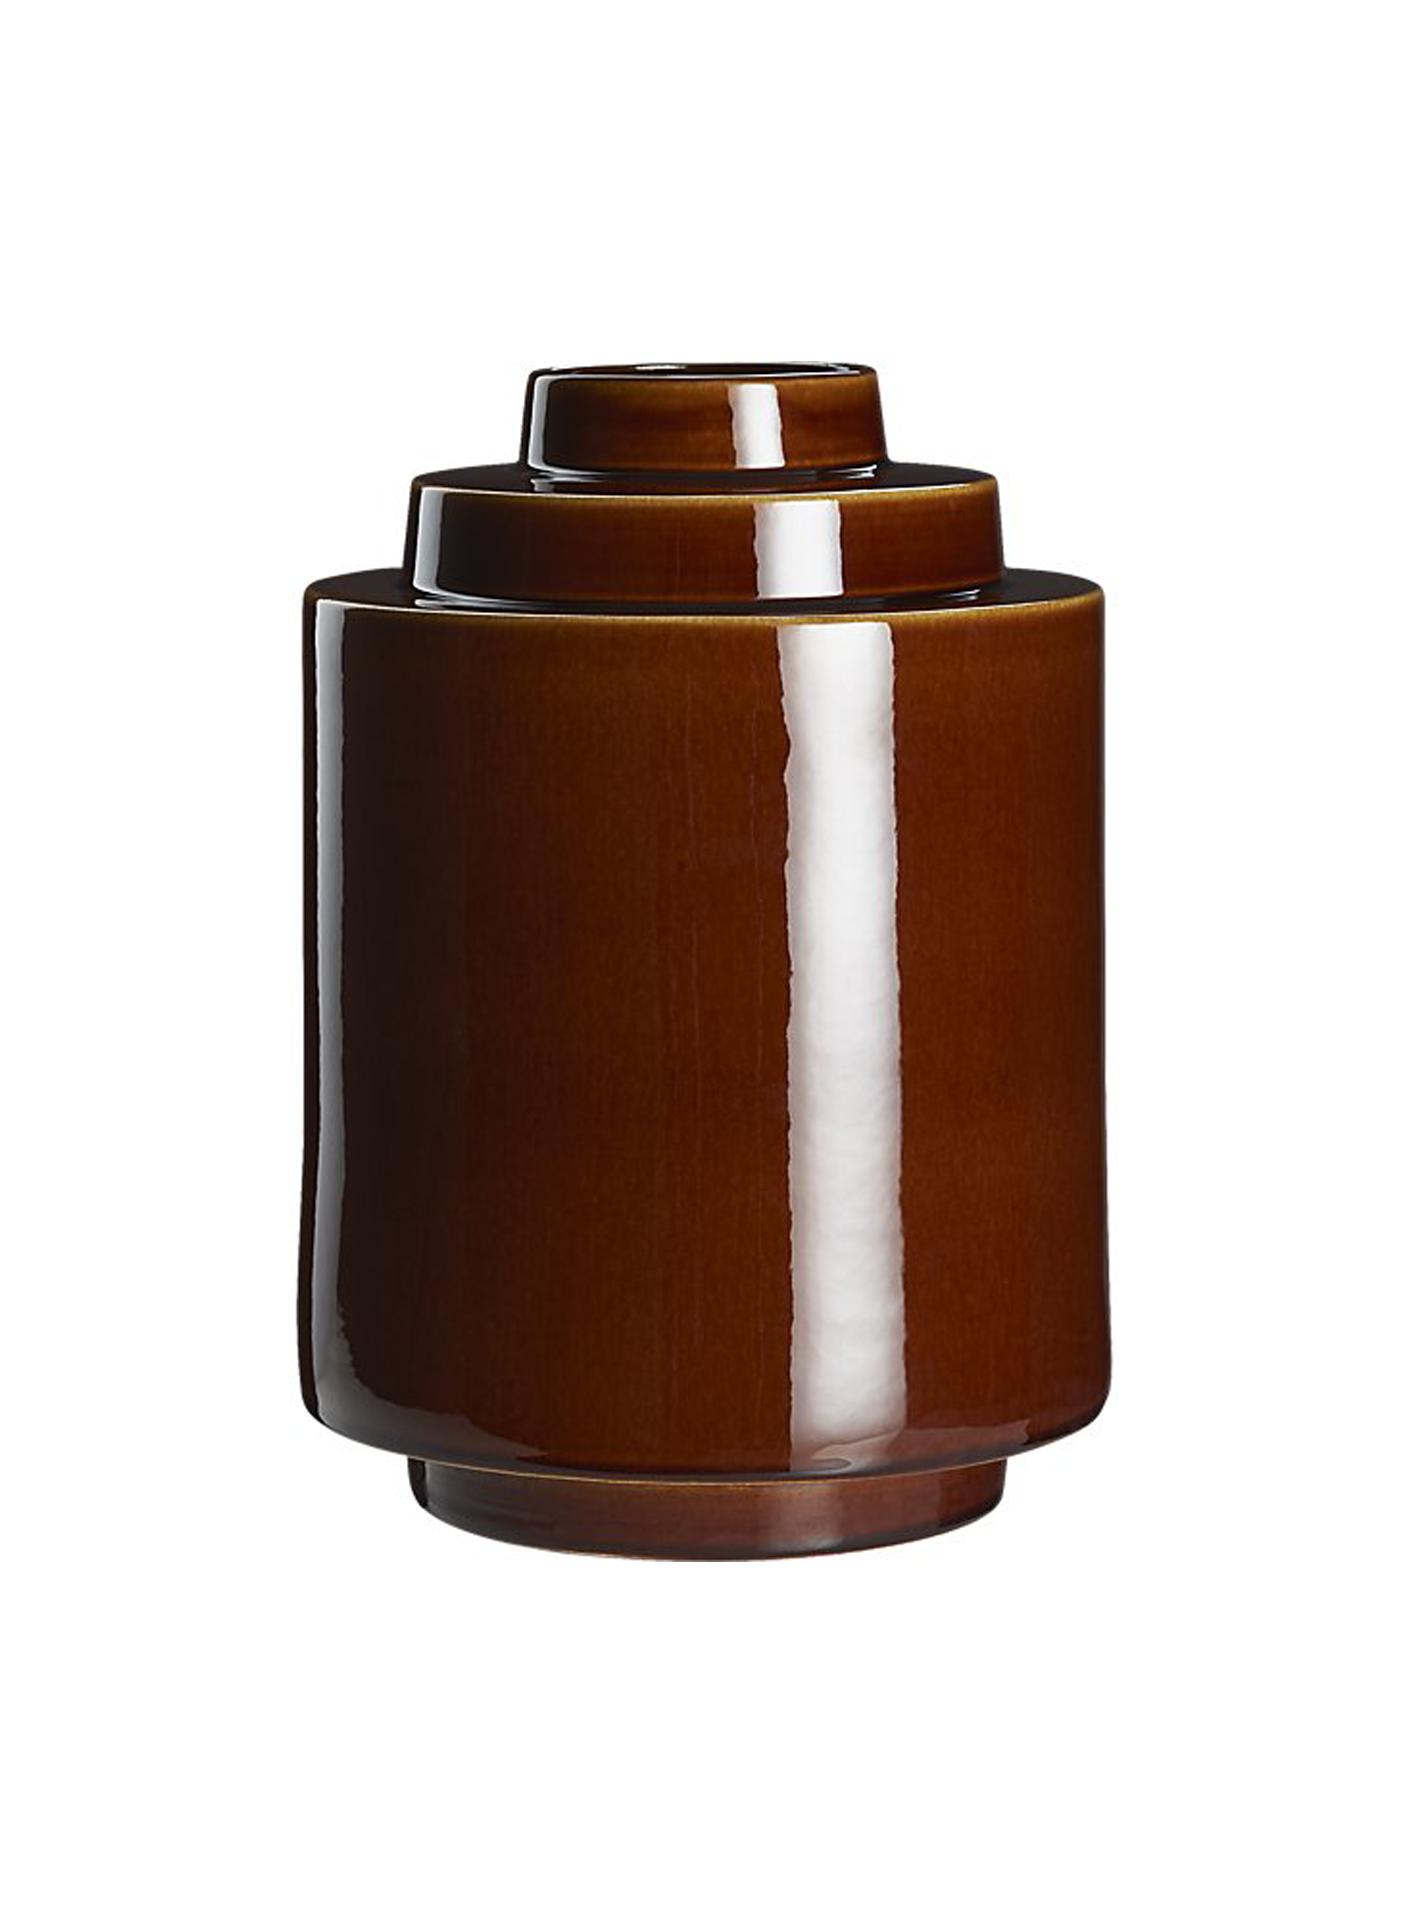 11-cb2-brown-vase.png